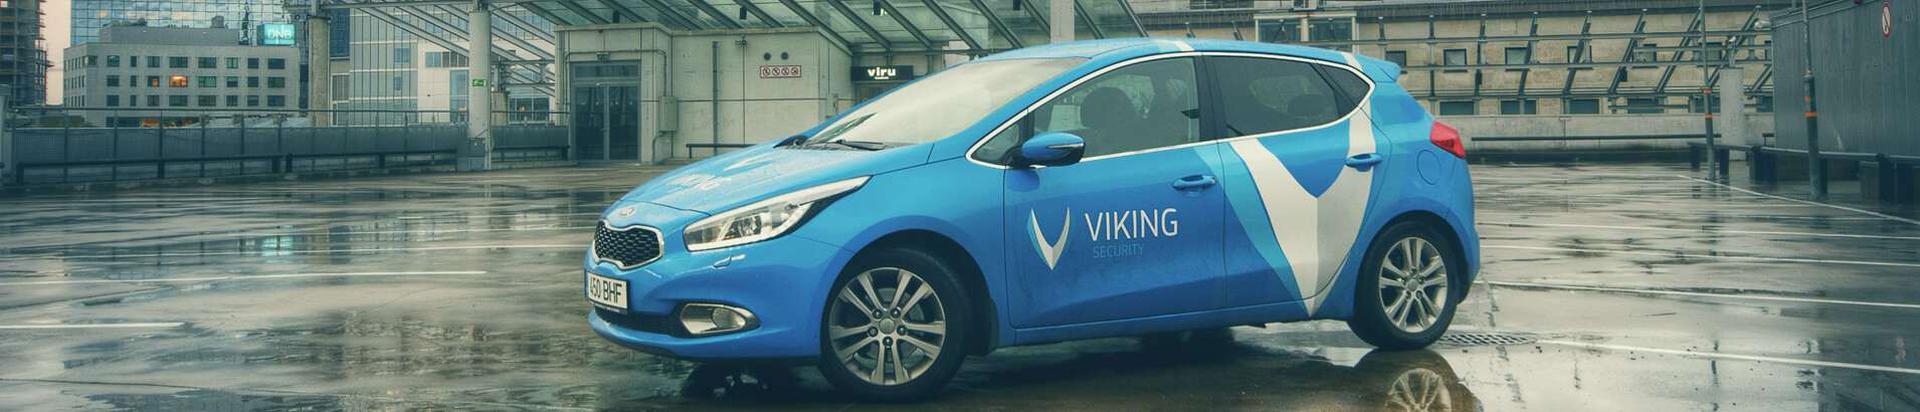 10026845_viking-security-as_83718919_xl.jpg